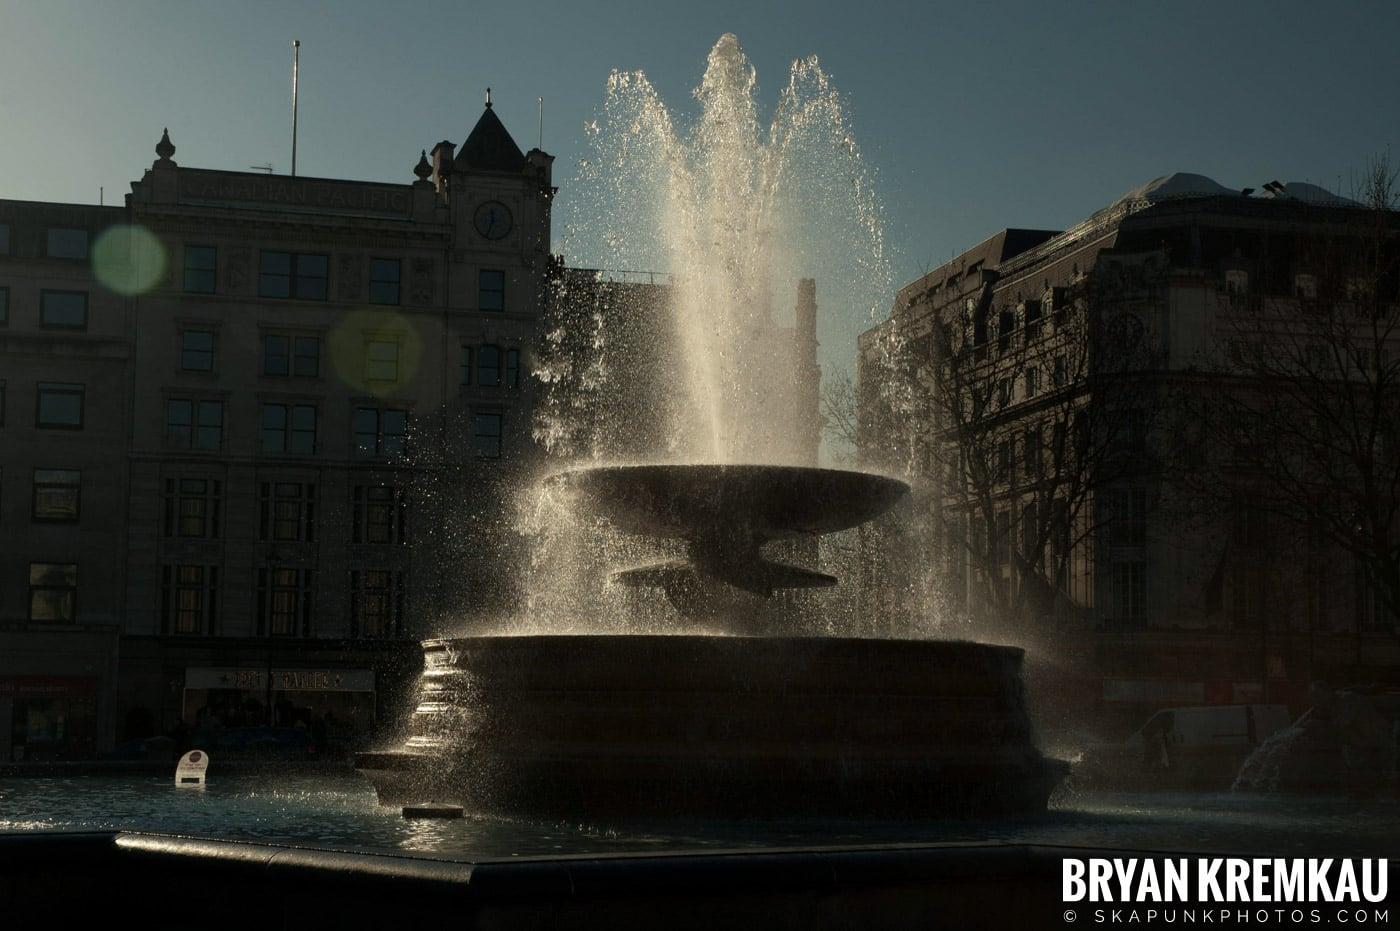 London, England - Day 5 - 12.17.06 (15)